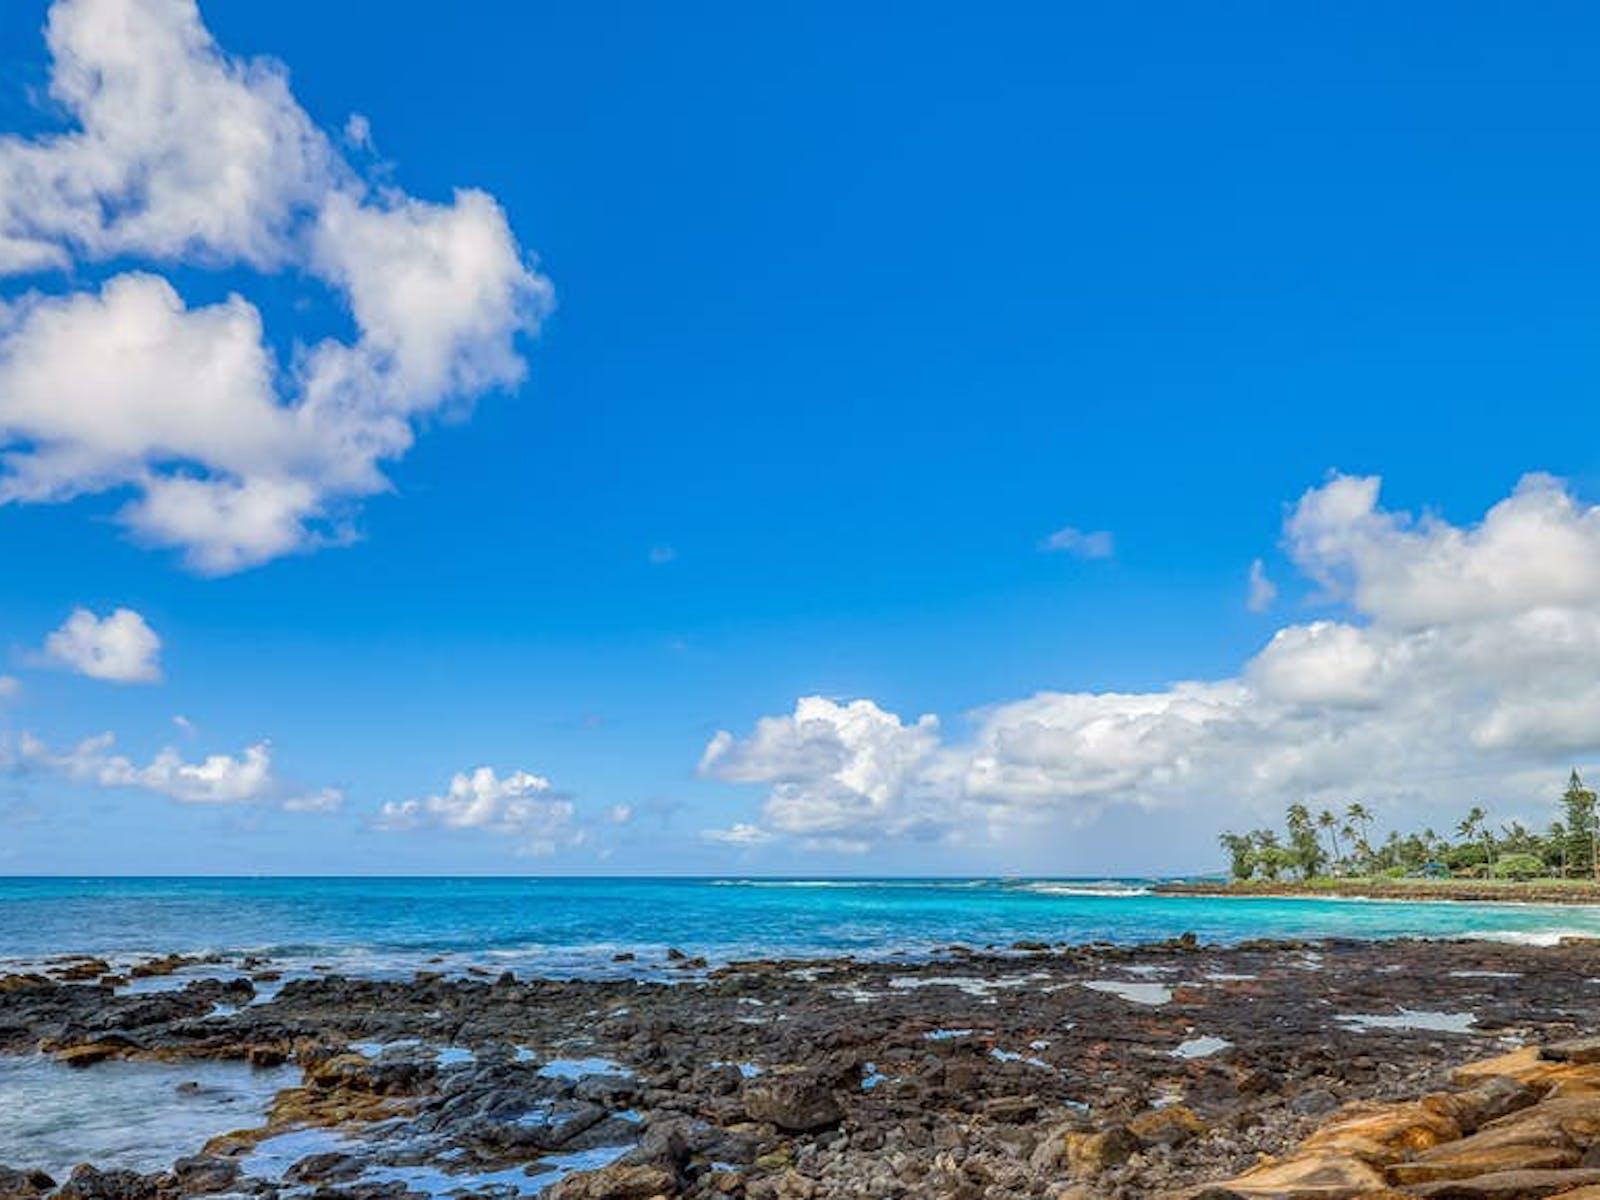 Poipu Bay shoreline in Poipu, HI